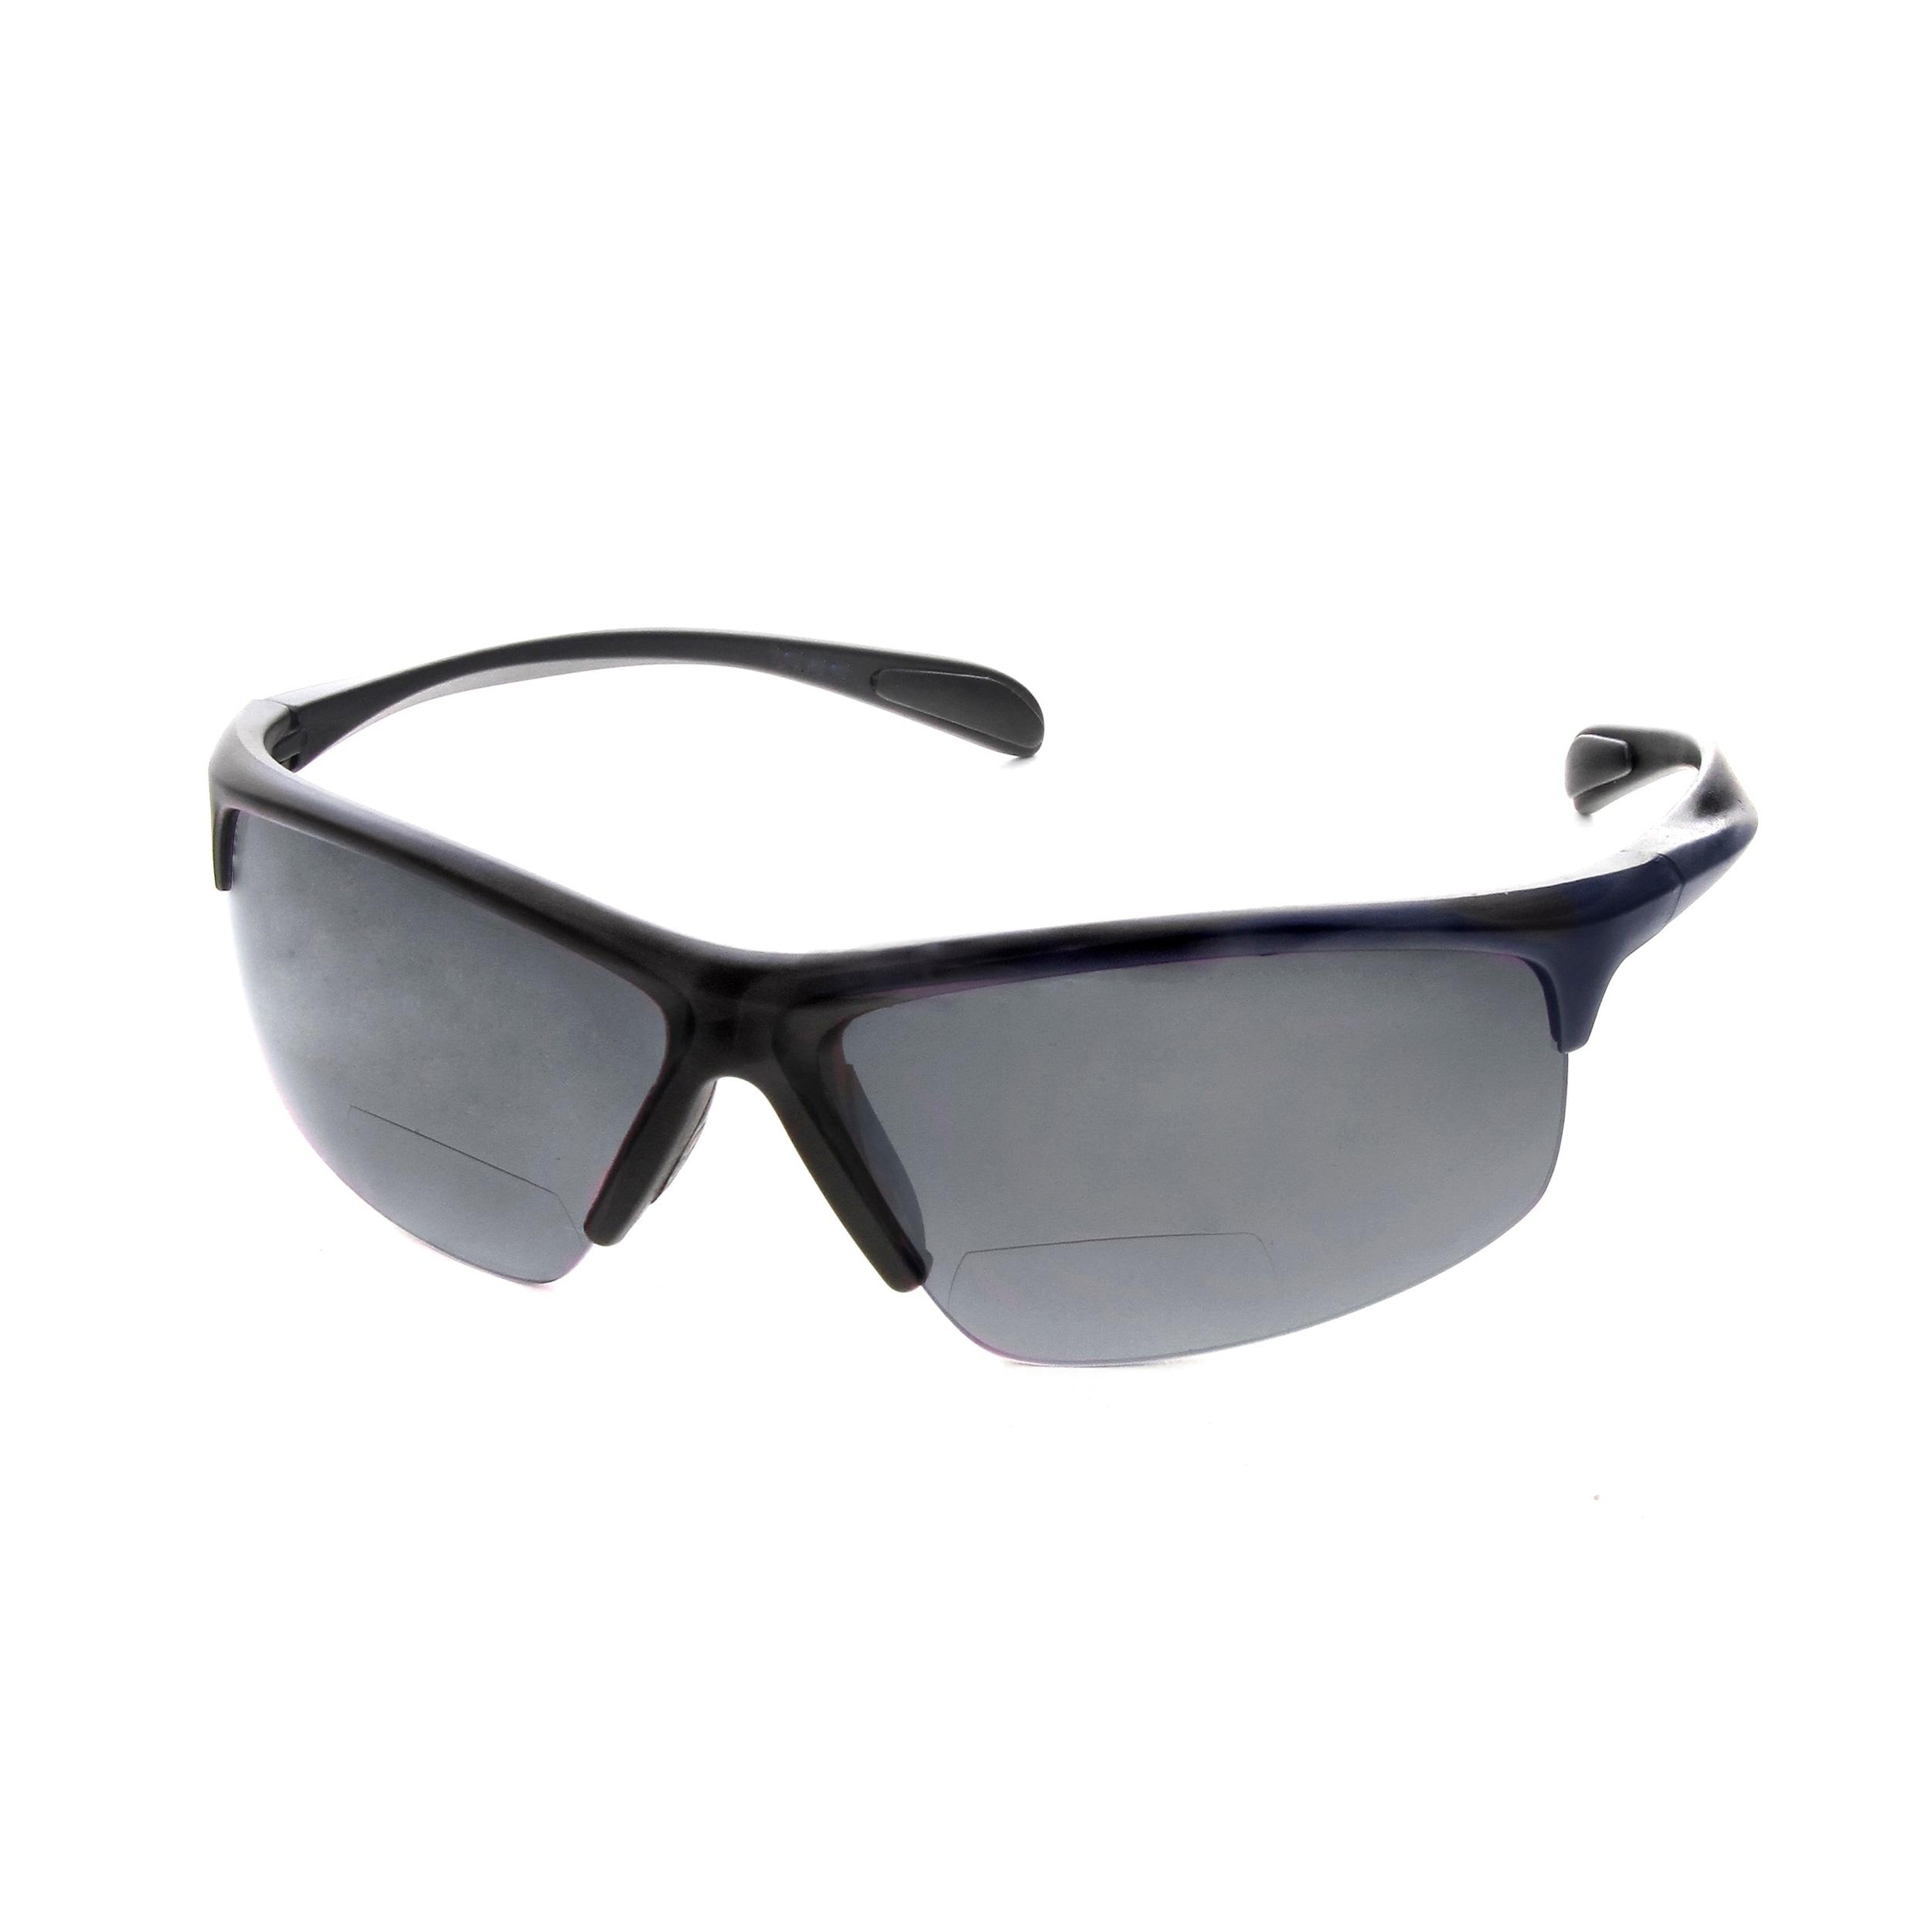 Hot Optix Men's Sport Wrap Sunglass Readers (3 - Metro Bl...